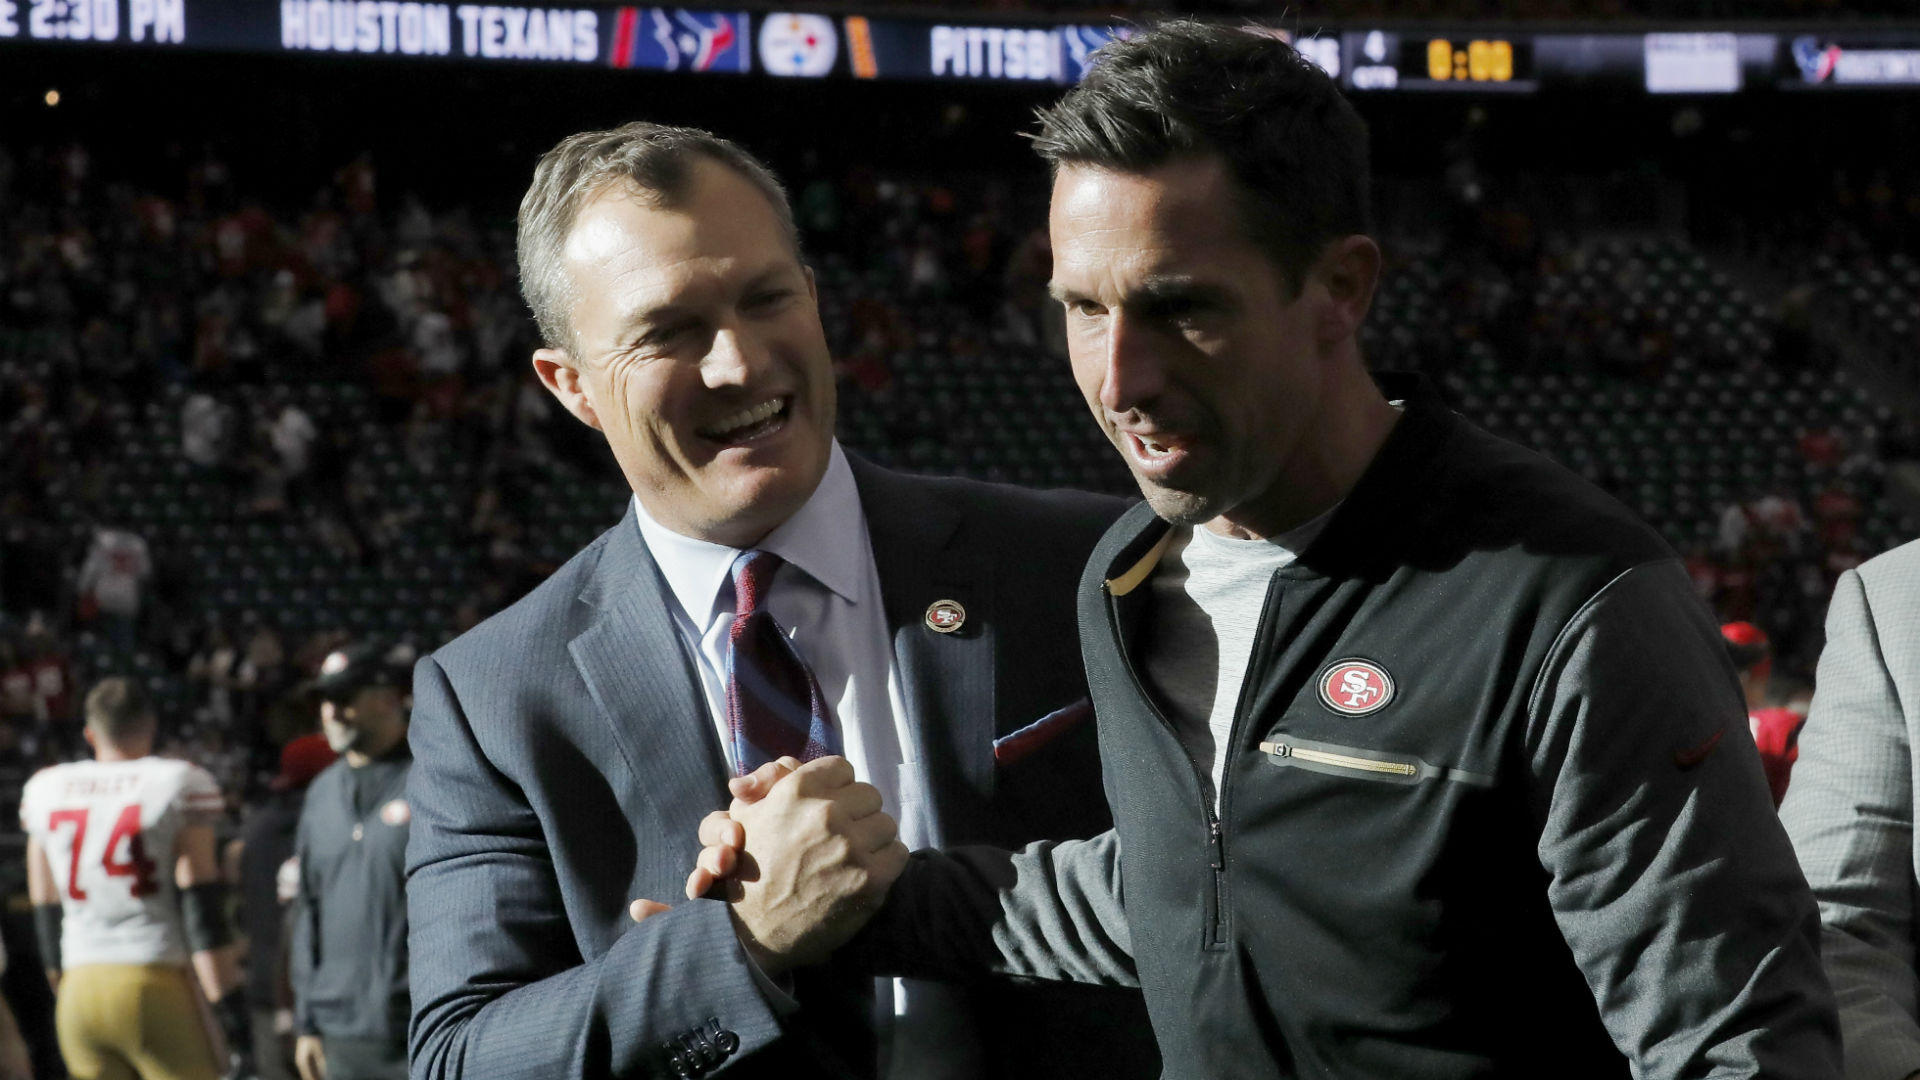 49ers trade rumors: San Francisco shopping top defenders, draft picks 1